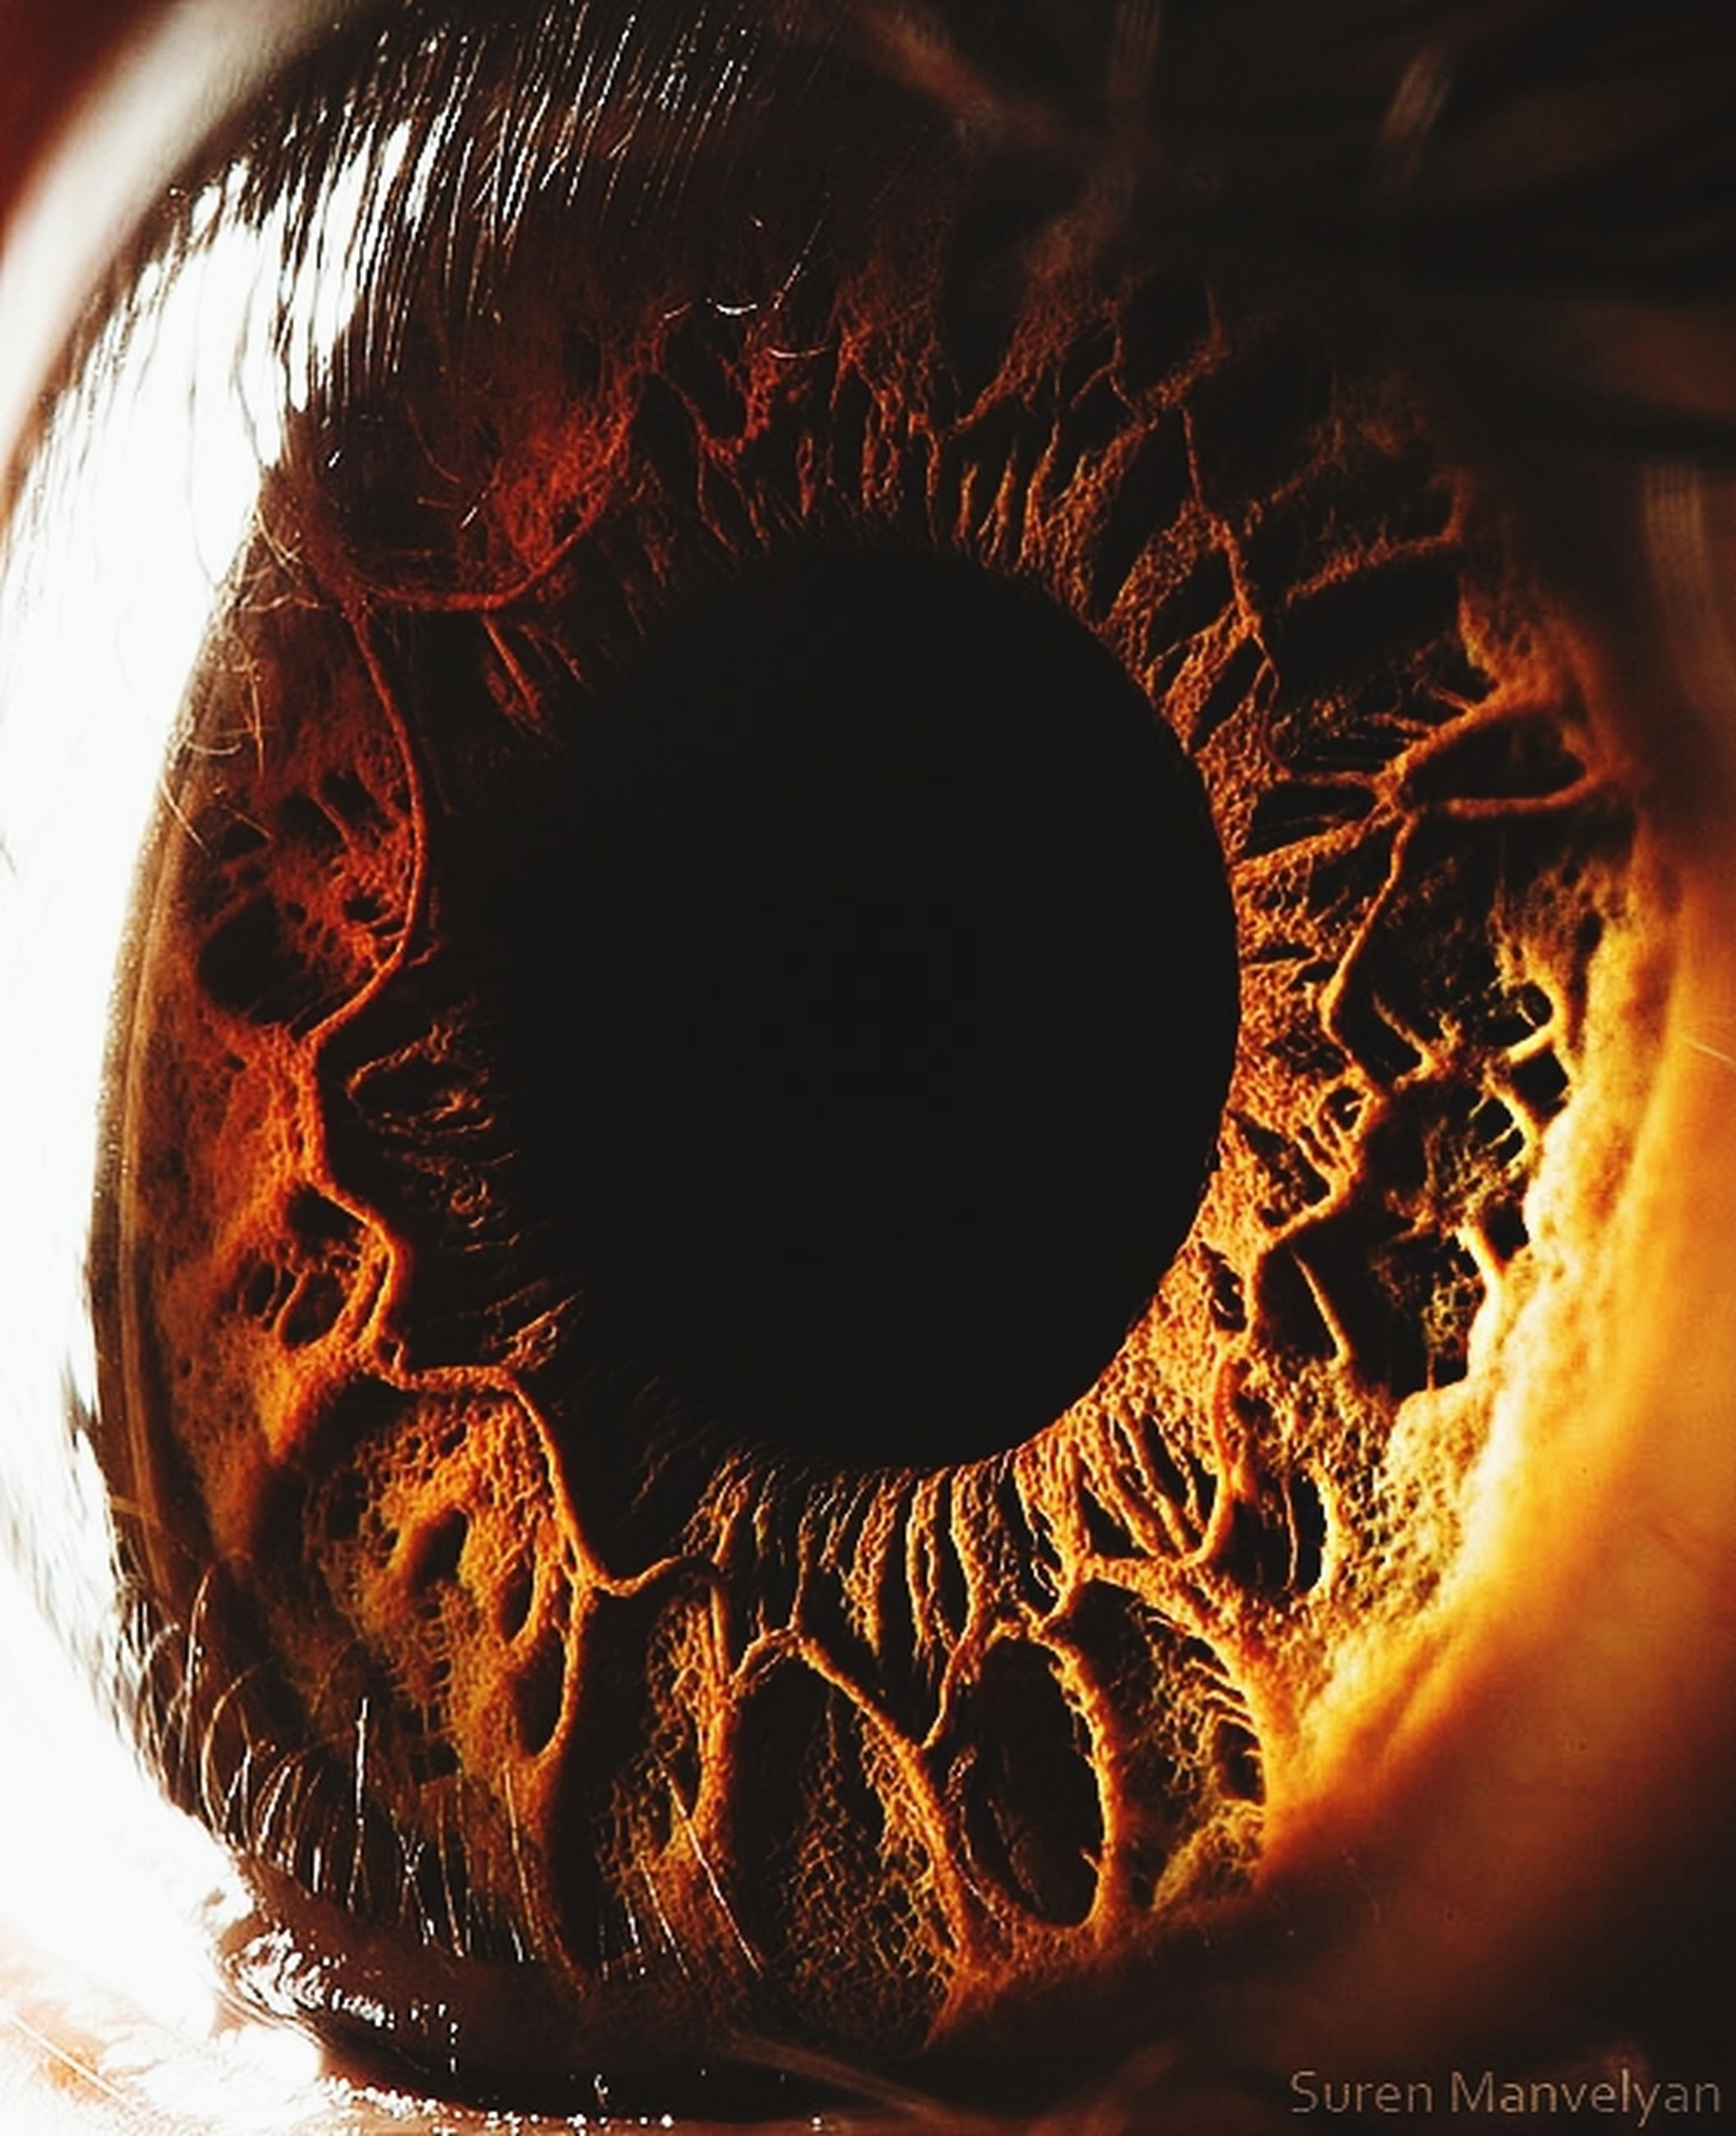 close-up, indoors, part of, lifestyles, human hair, human eye, person, human skin, eyesight, unrecognizable person, leisure activity, sensory perception, cropped, headshot, human face, studio shot